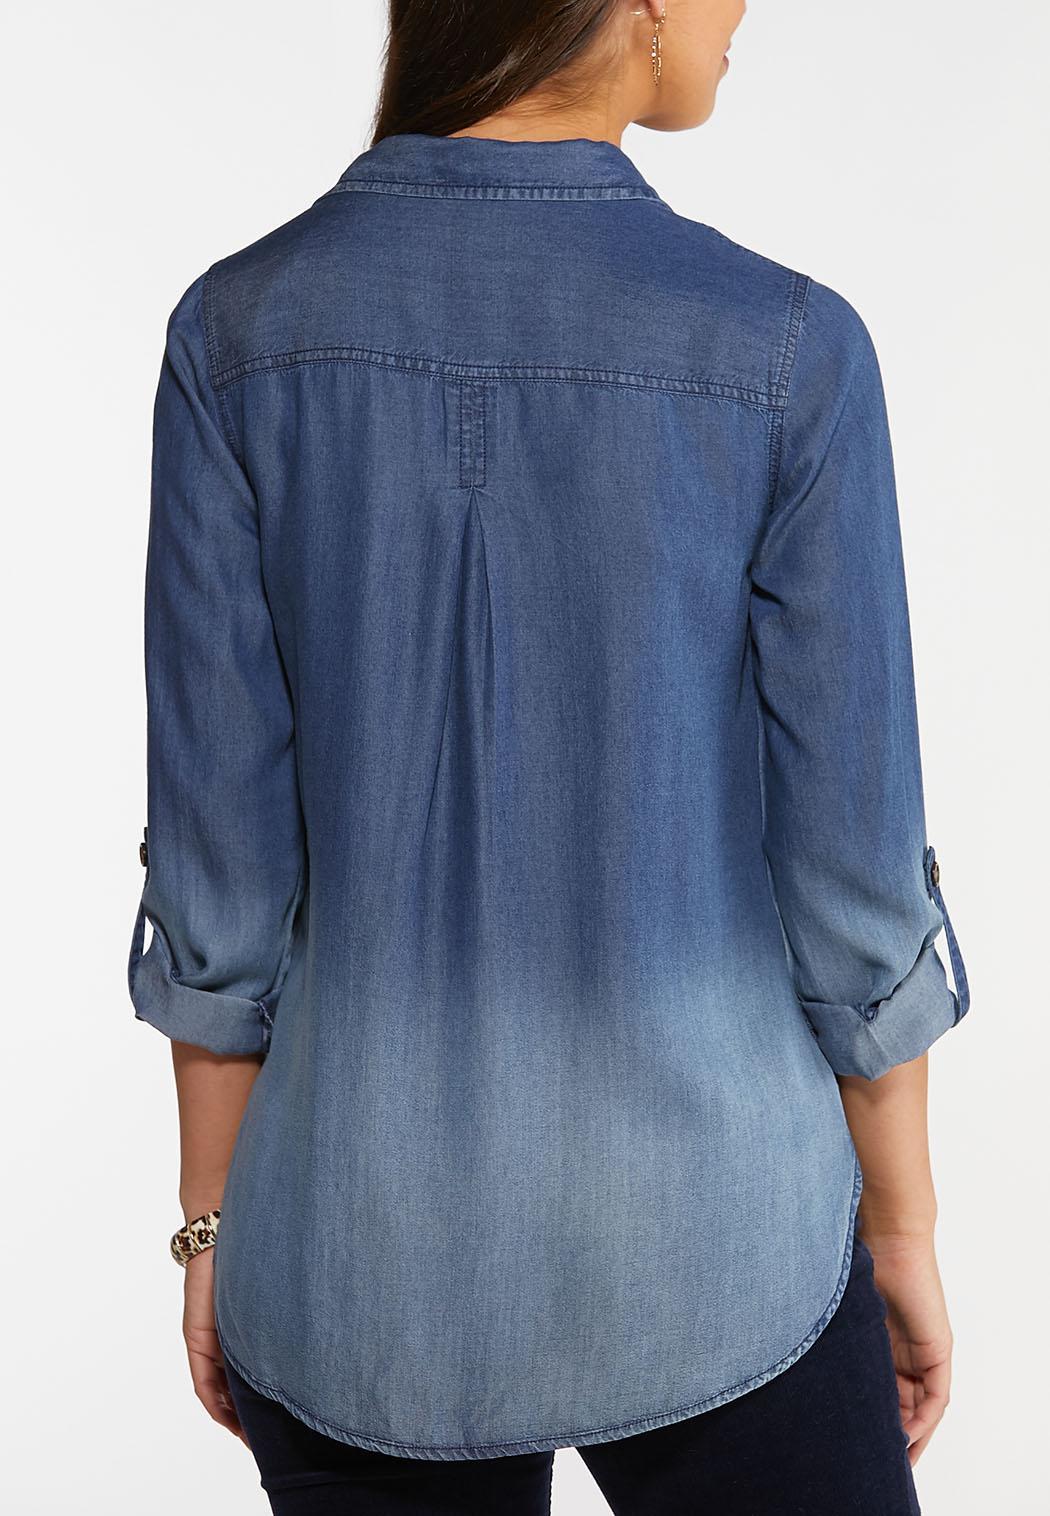 Plus Size Faded Chambray Shirt Shirts & Amp ; Blouses Cato Fashions